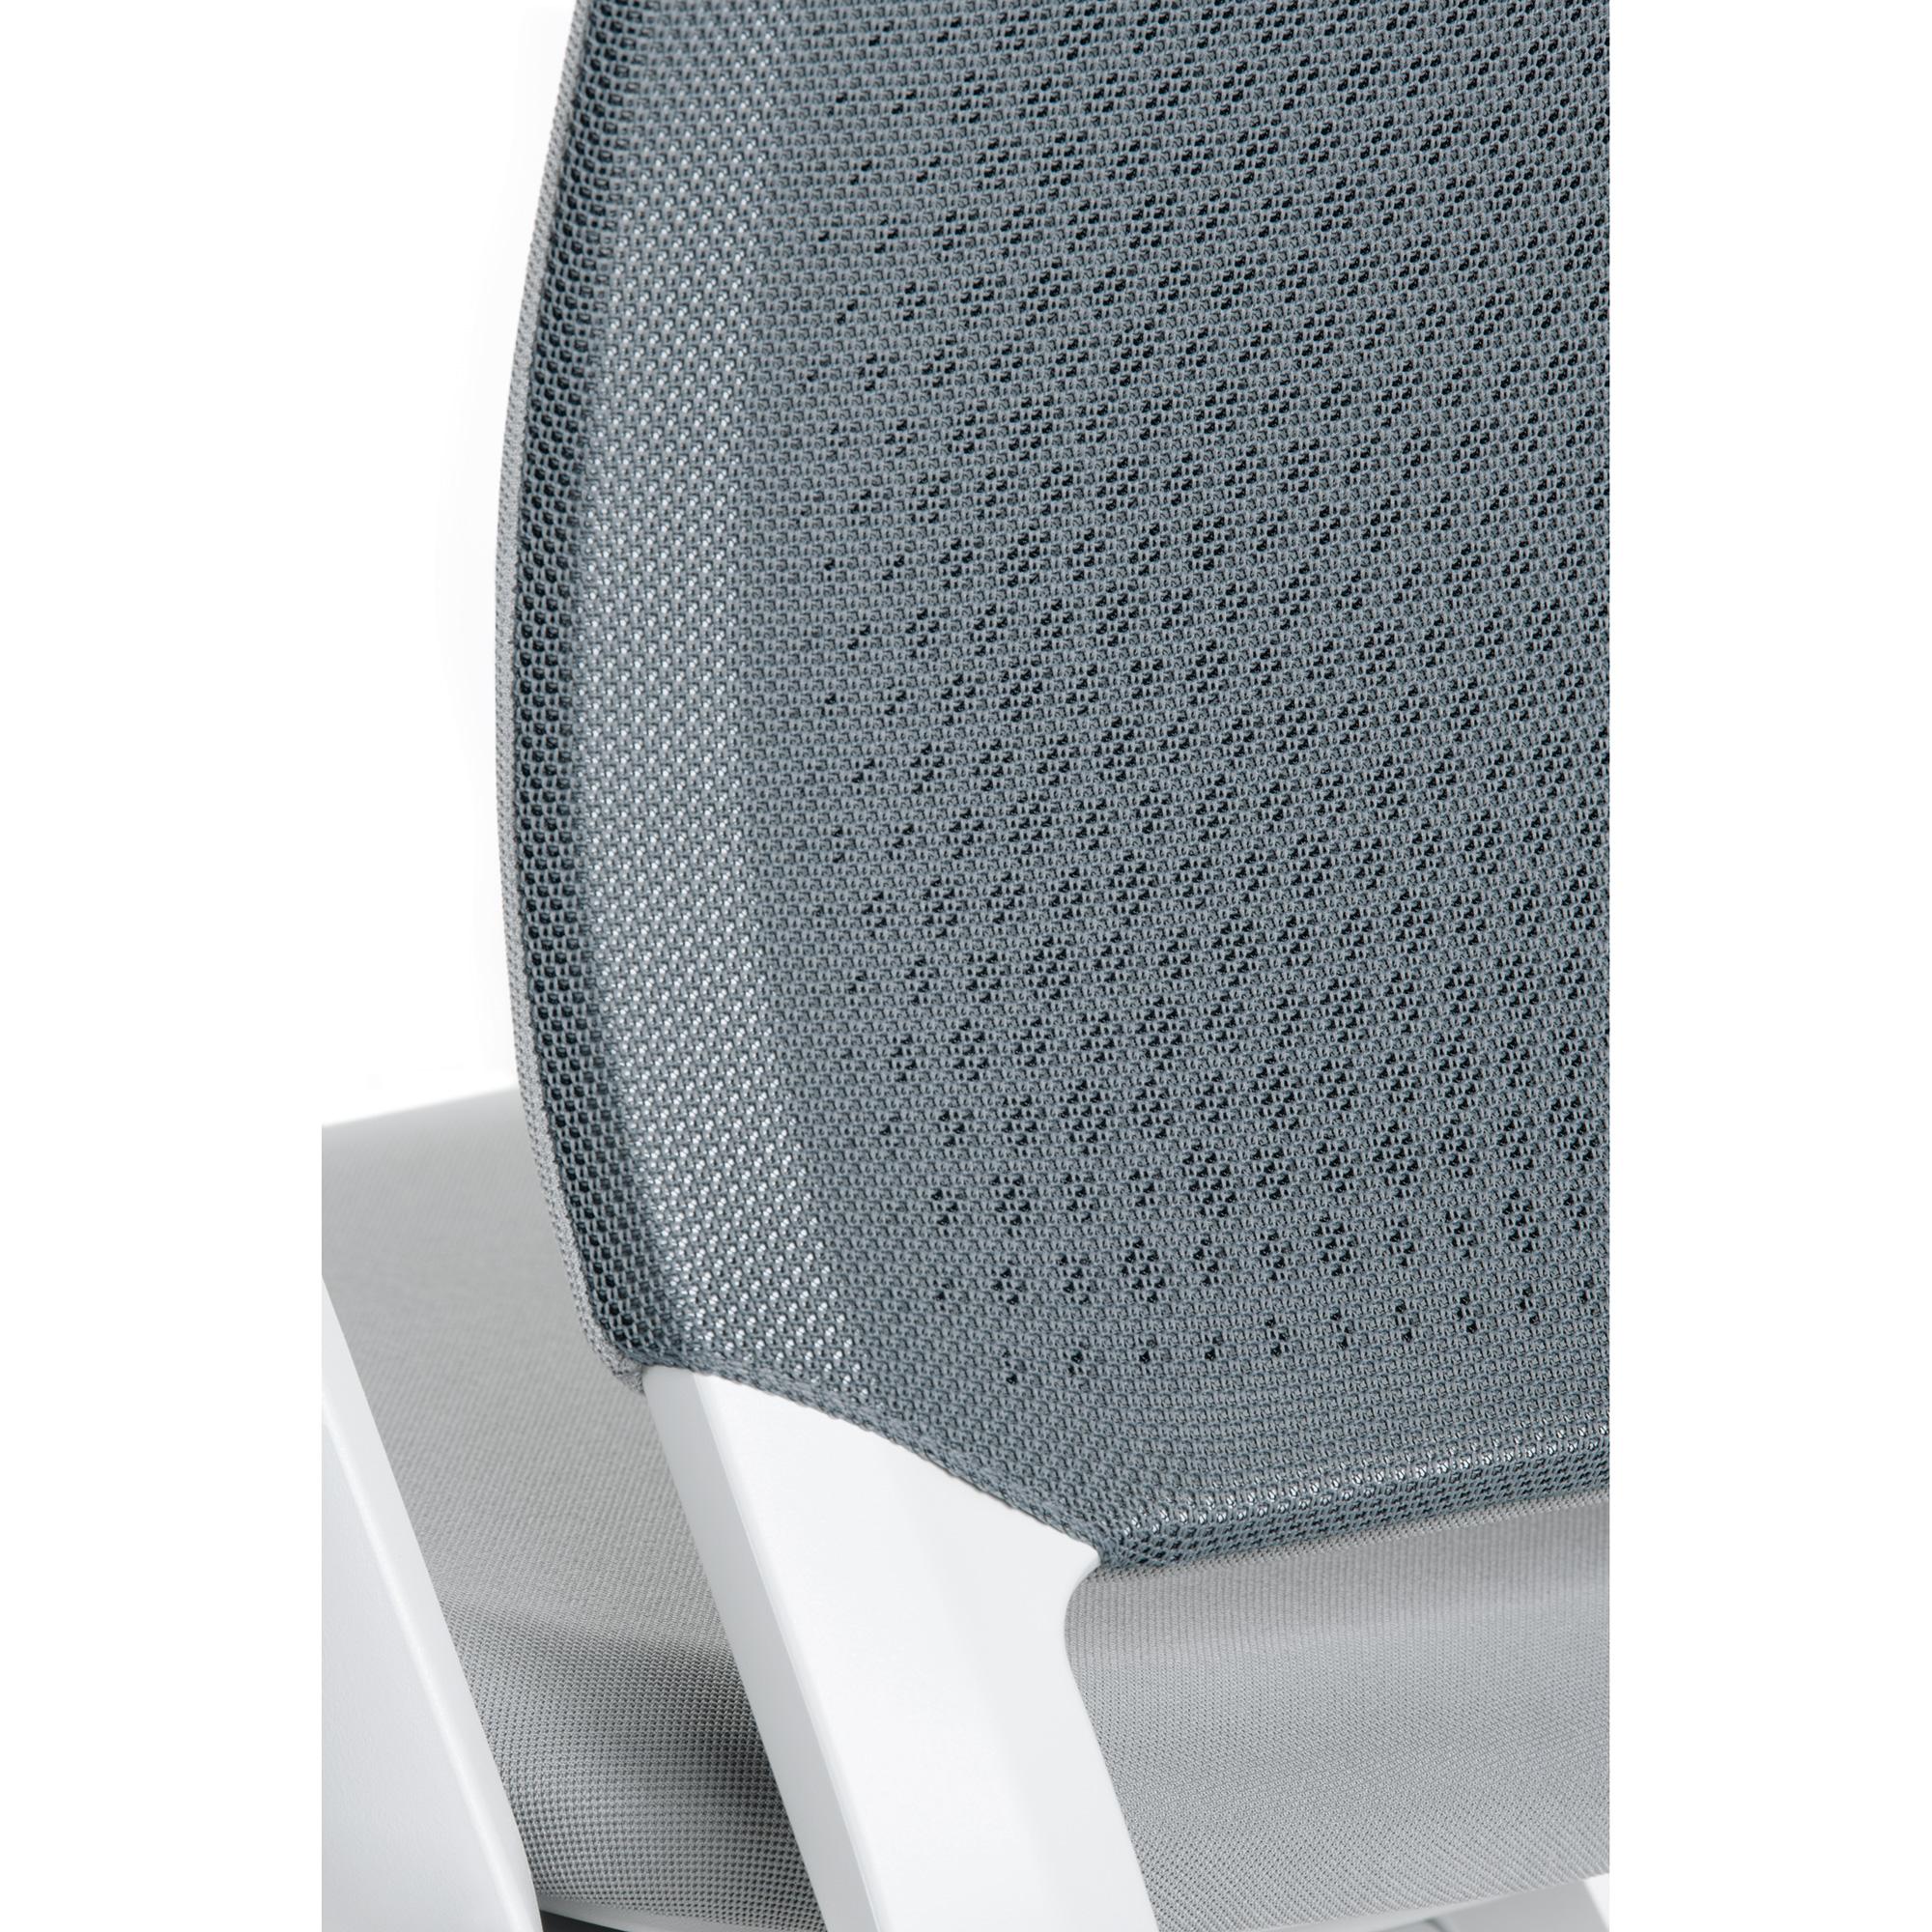 Sedus se:motion Bürostuhl EM-101 mit austauschbaren Polstern